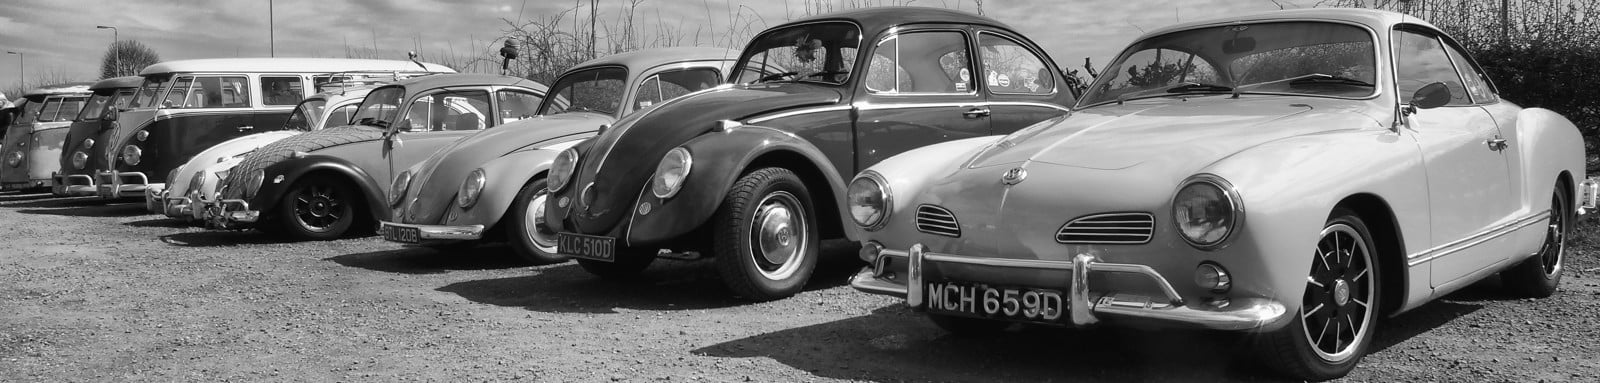 Aircooled Volkswagens